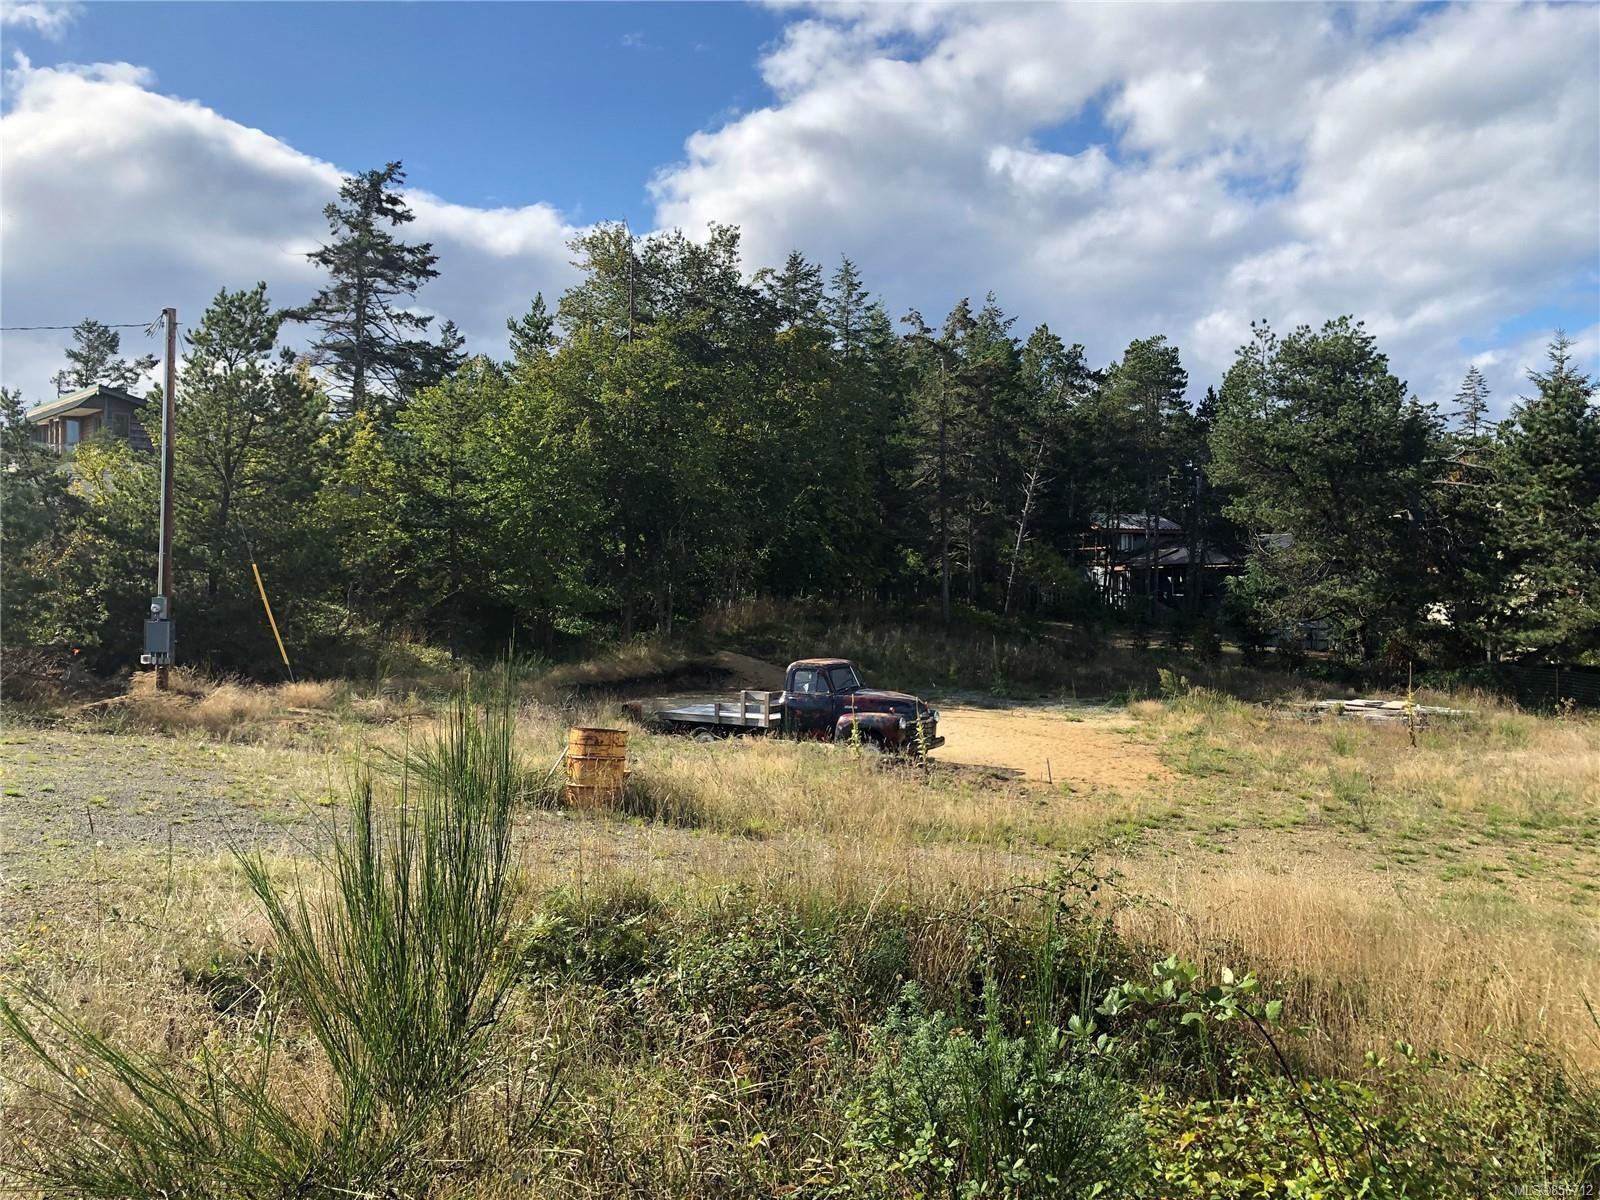 Main Photo: 650 Lazo Rd in : CV Comox Peninsula Land for sale (Comox Valley)  : MLS®# 856712